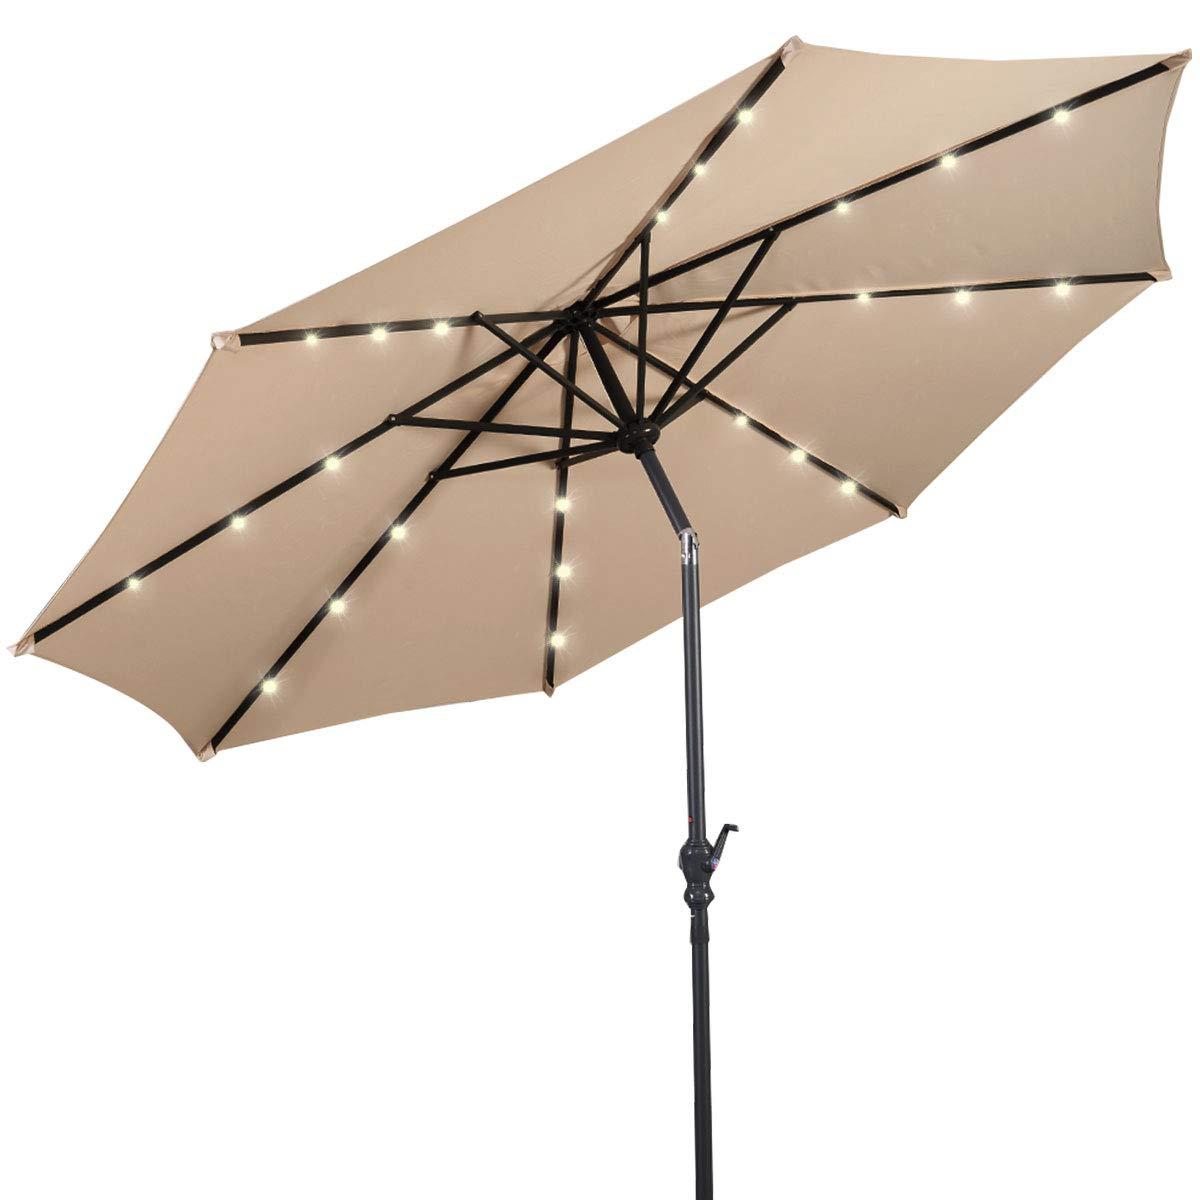 Giantex 10ft Solar Patio Umbrella Sunbrella with LED Lighted, 8 Ribs Market Steel Tilt w/Crank for Garden, Deck, Backyard, Pool Indoor Outdoor Use, Beige NewStyle by Giantex